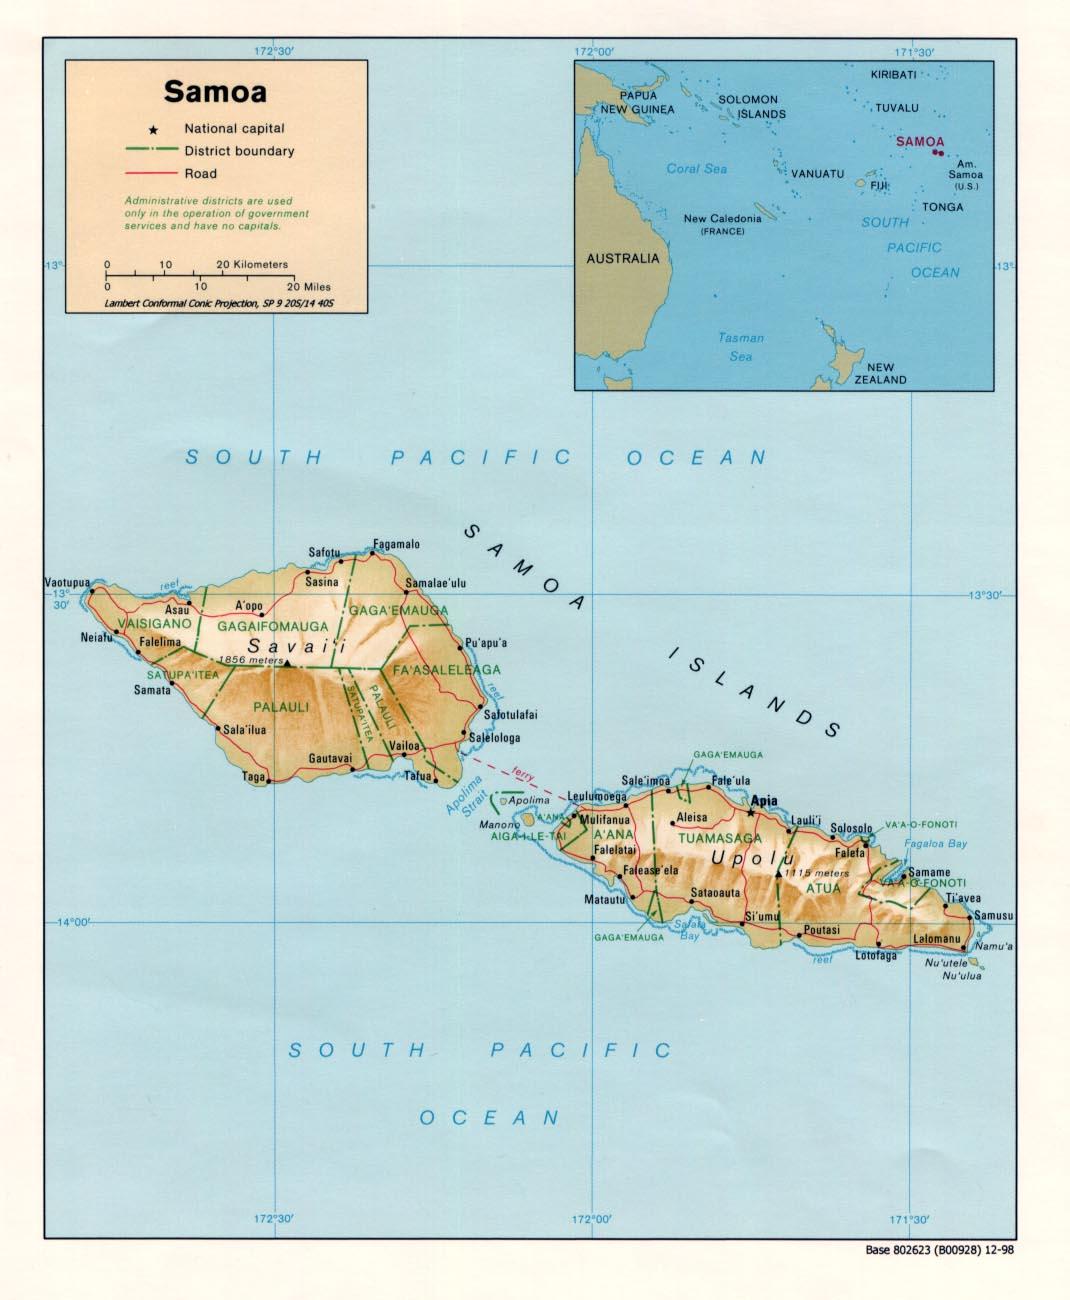 Samoa Maps PerryCastañeda Map Collection UT Library Online - Samoa map